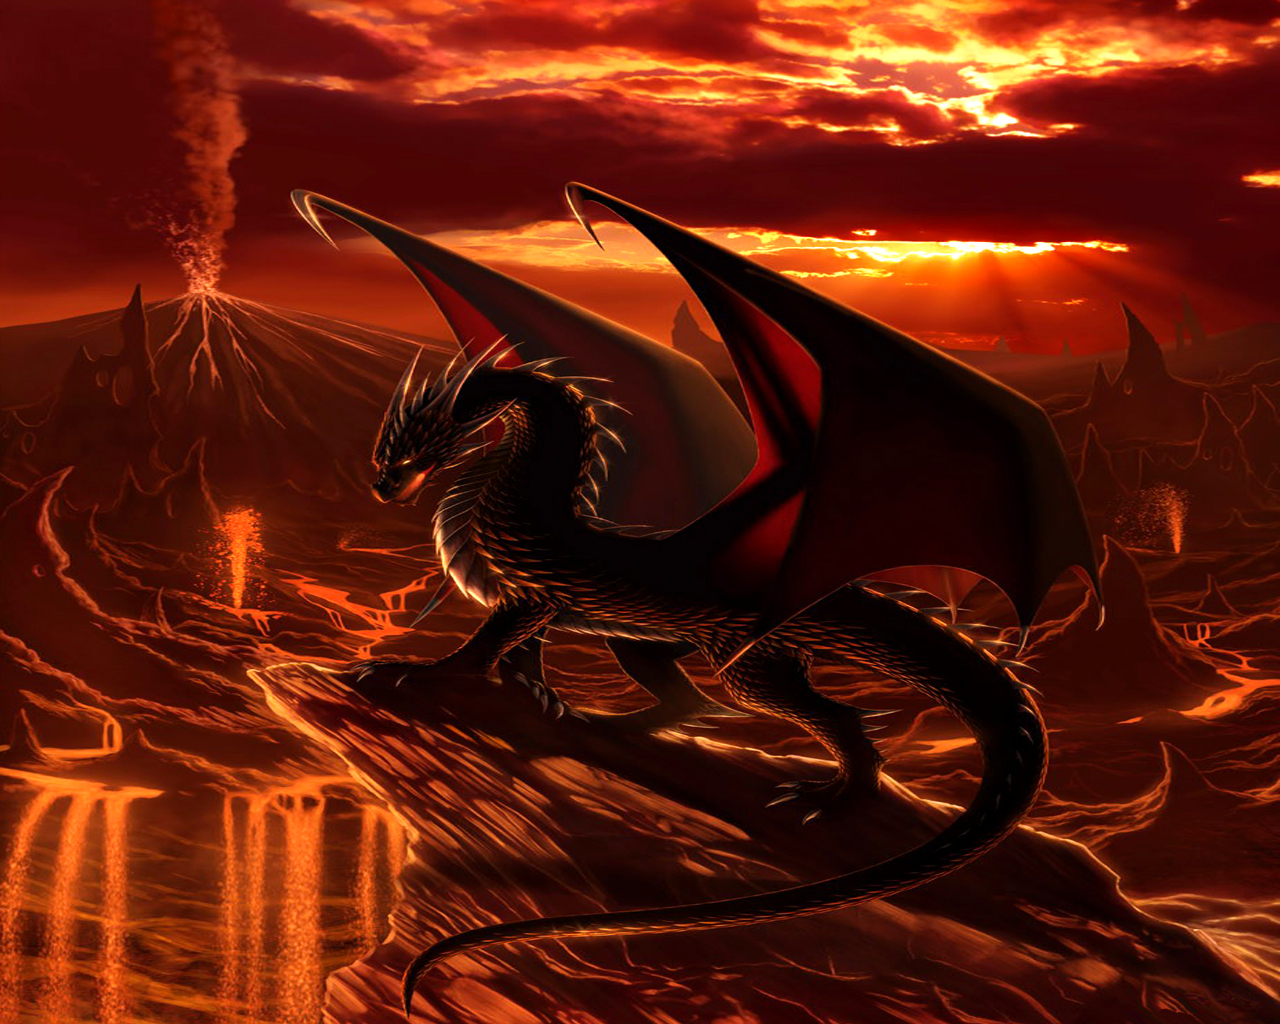 Dragons images Dragon Wallpaper wallpaper photos 13975550 1280x1024